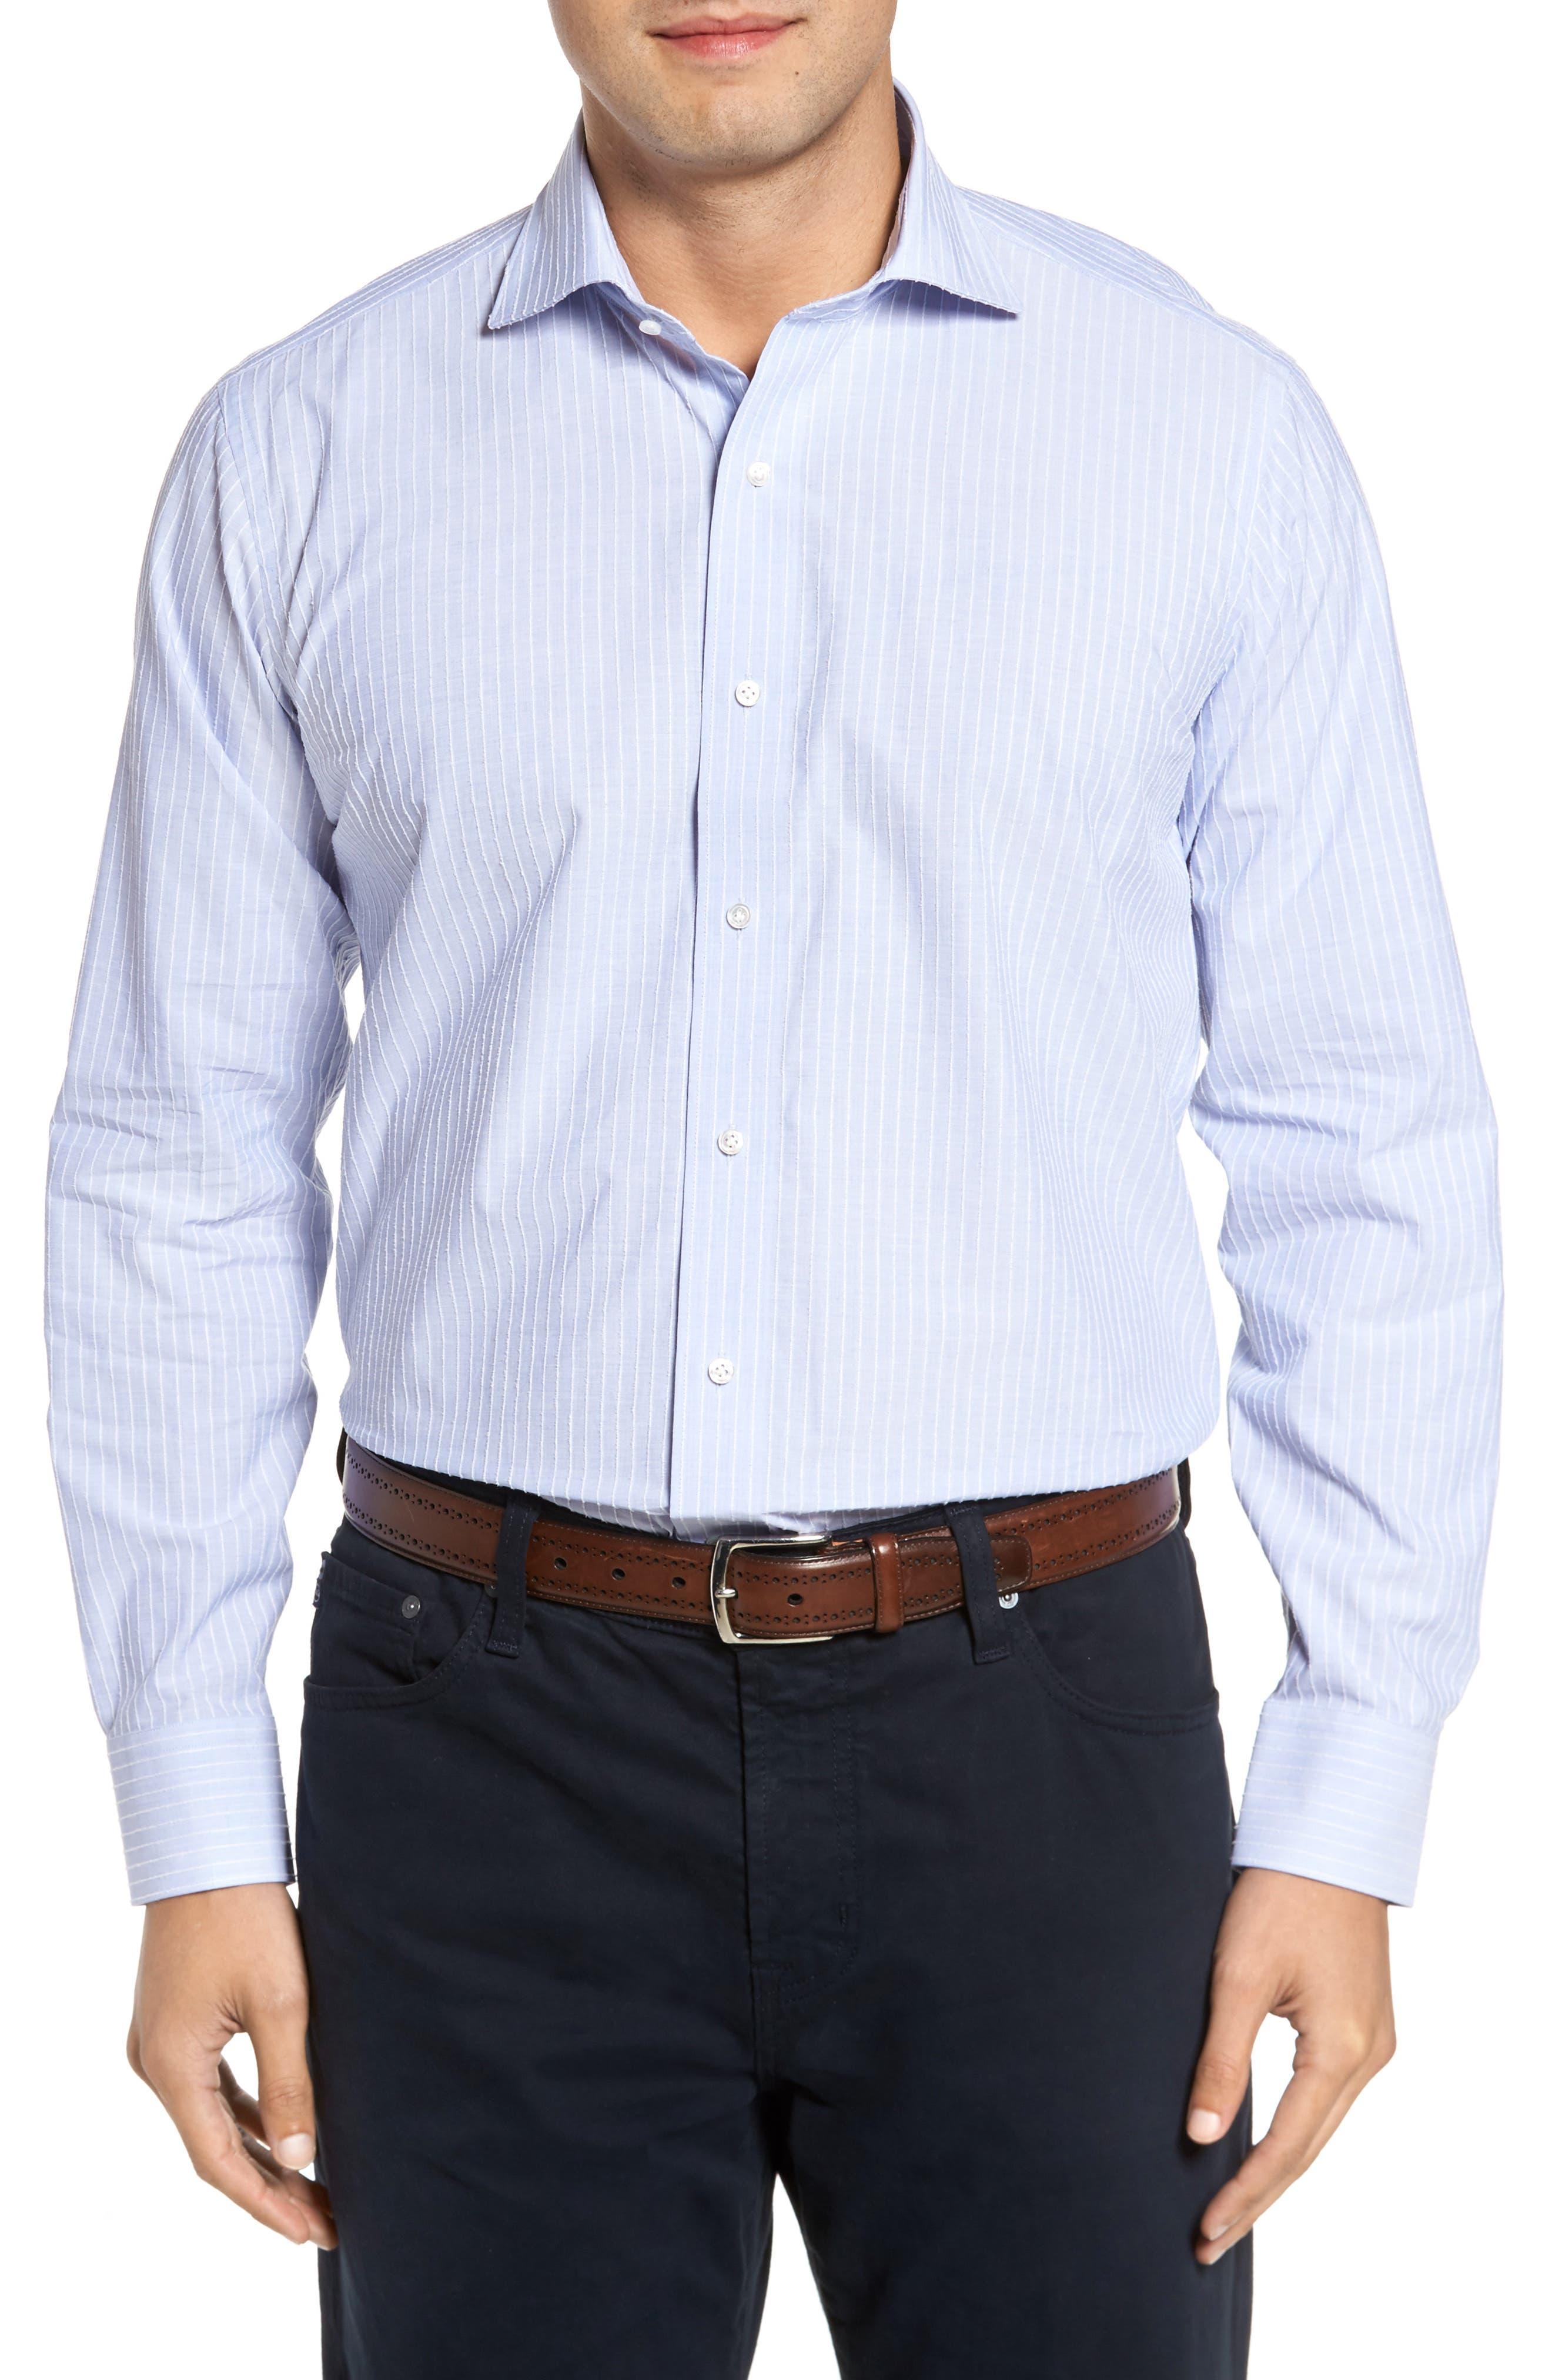 Cejar Stripe Sport Shirt,                             Main thumbnail 1, color,                             433